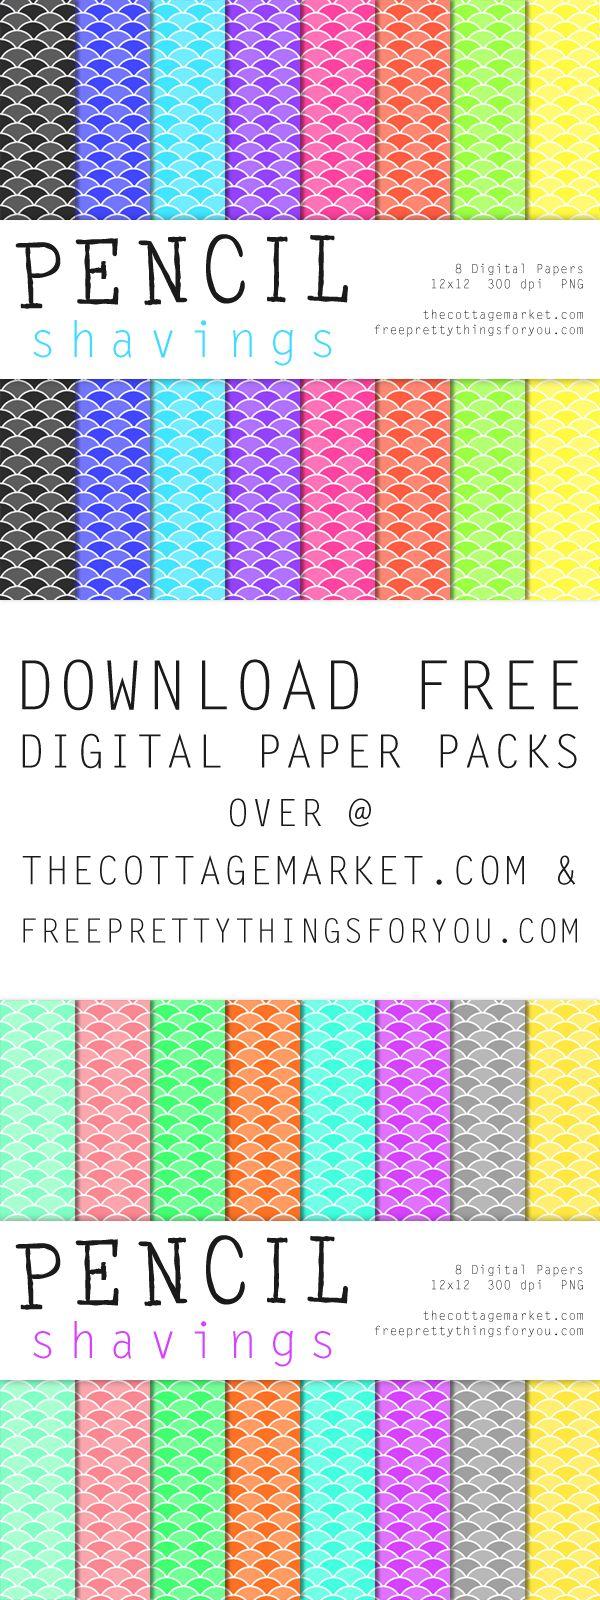 Free Pencil Shaving Digital Scrapbooking Paper Part 1 - The Cottage Market